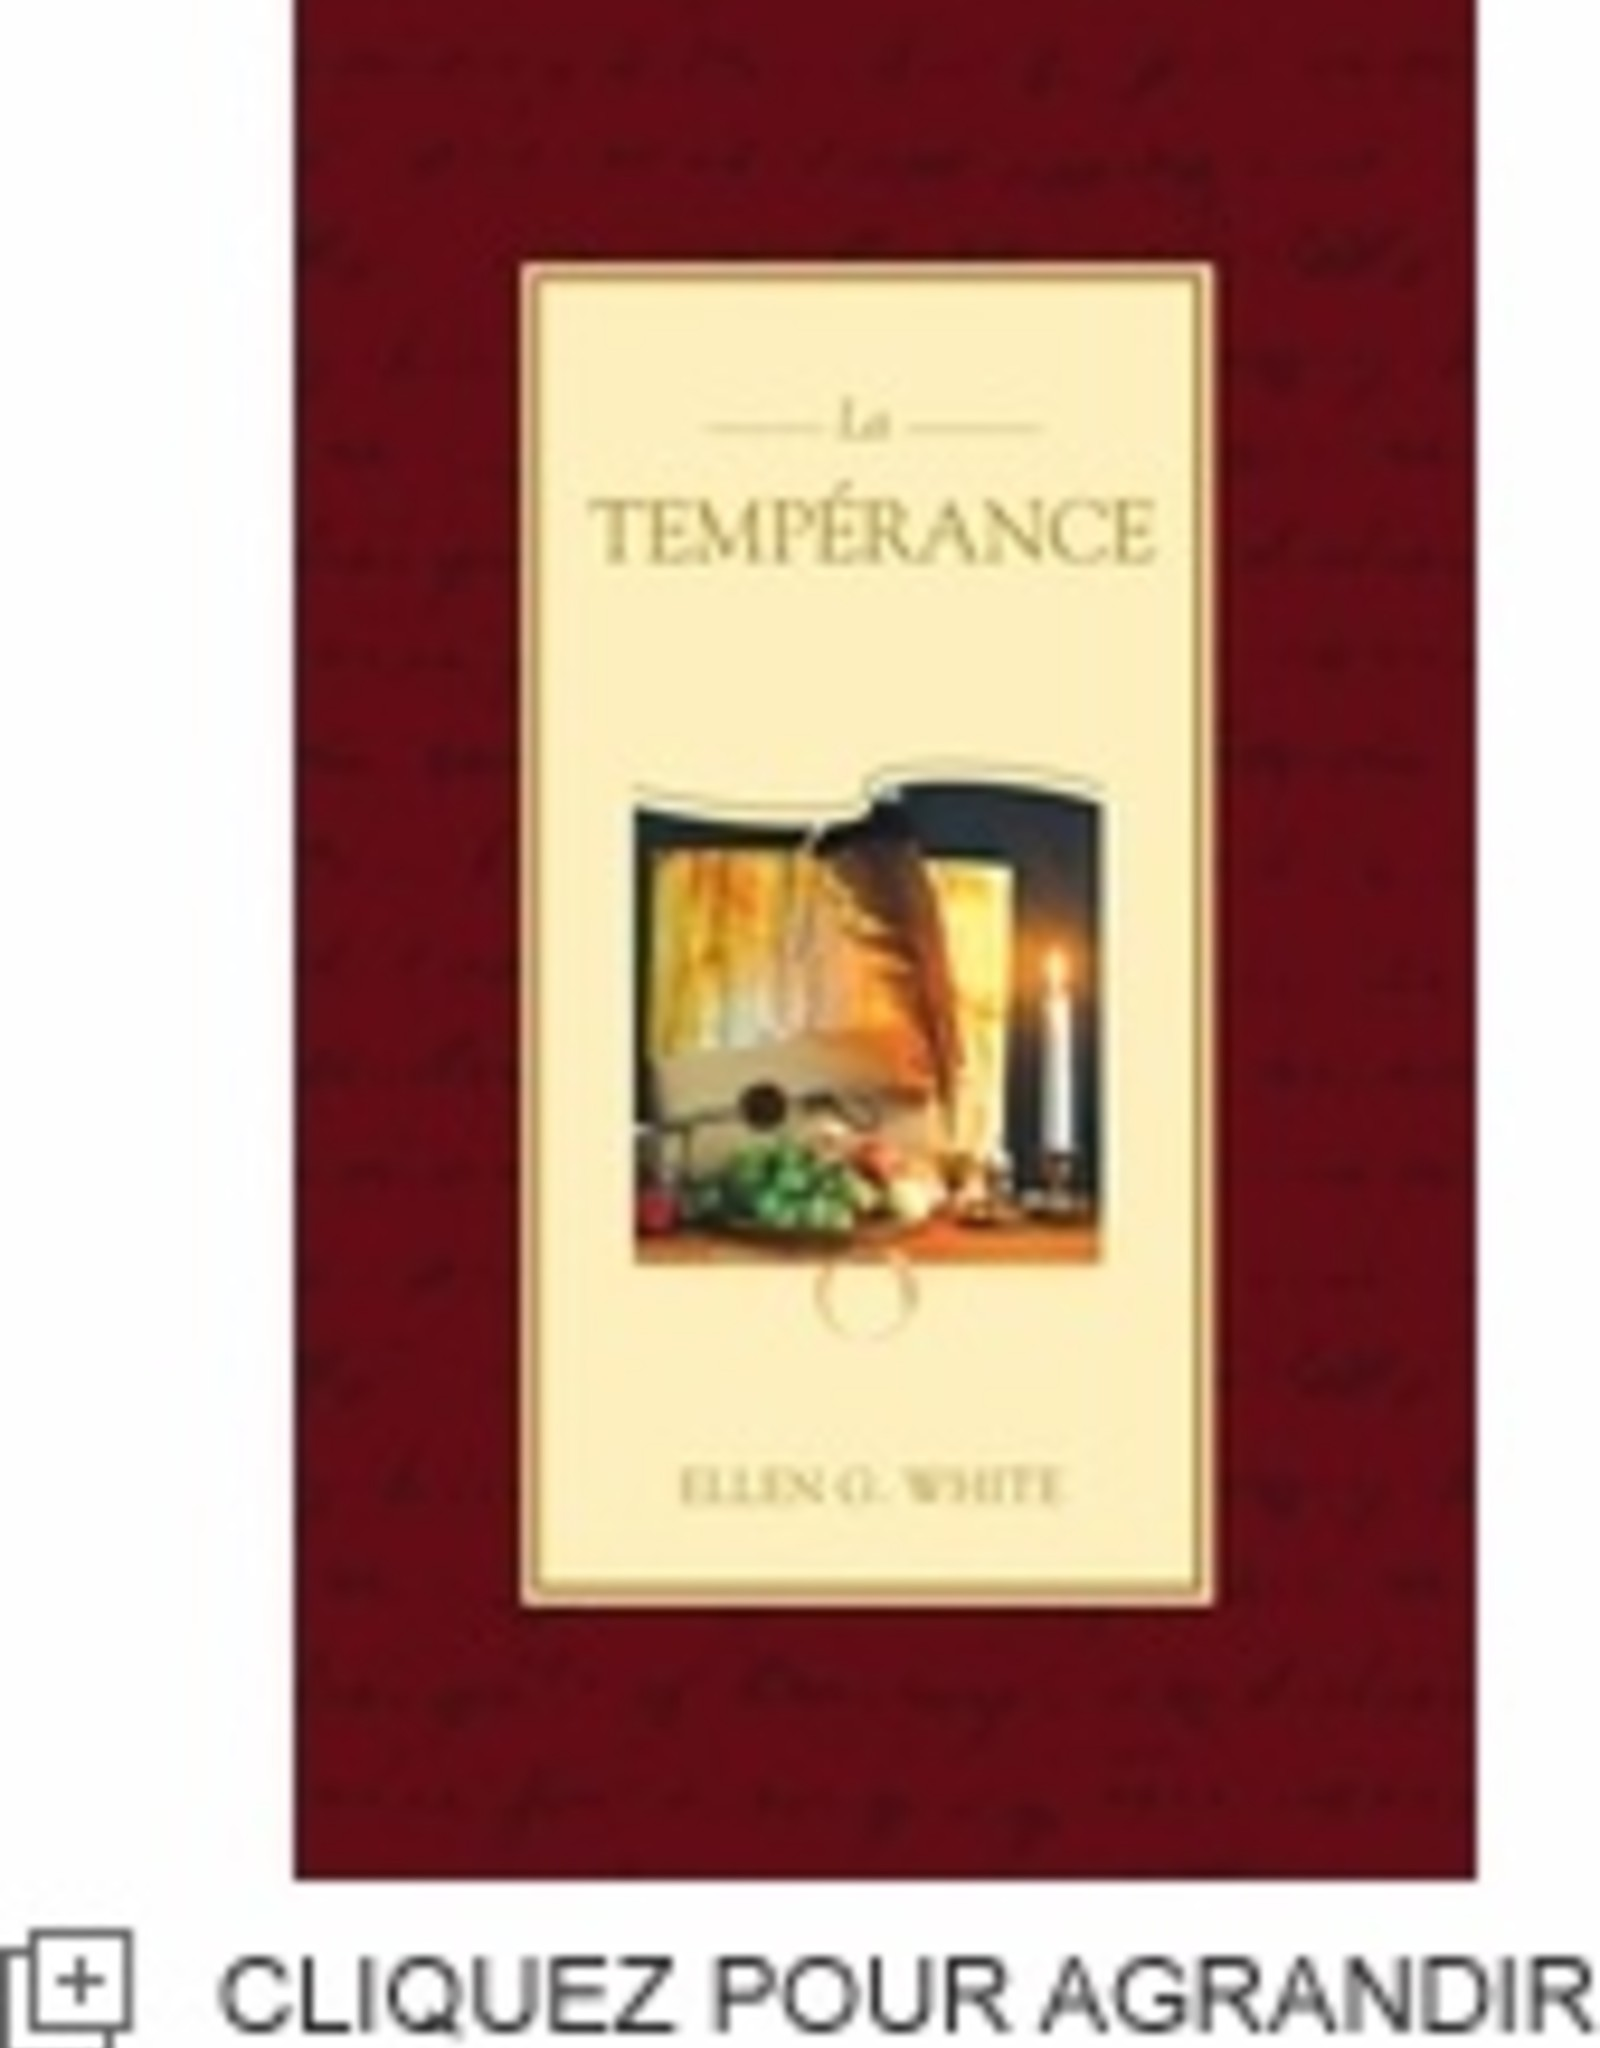 La tempérance (IADPA couverture souple)